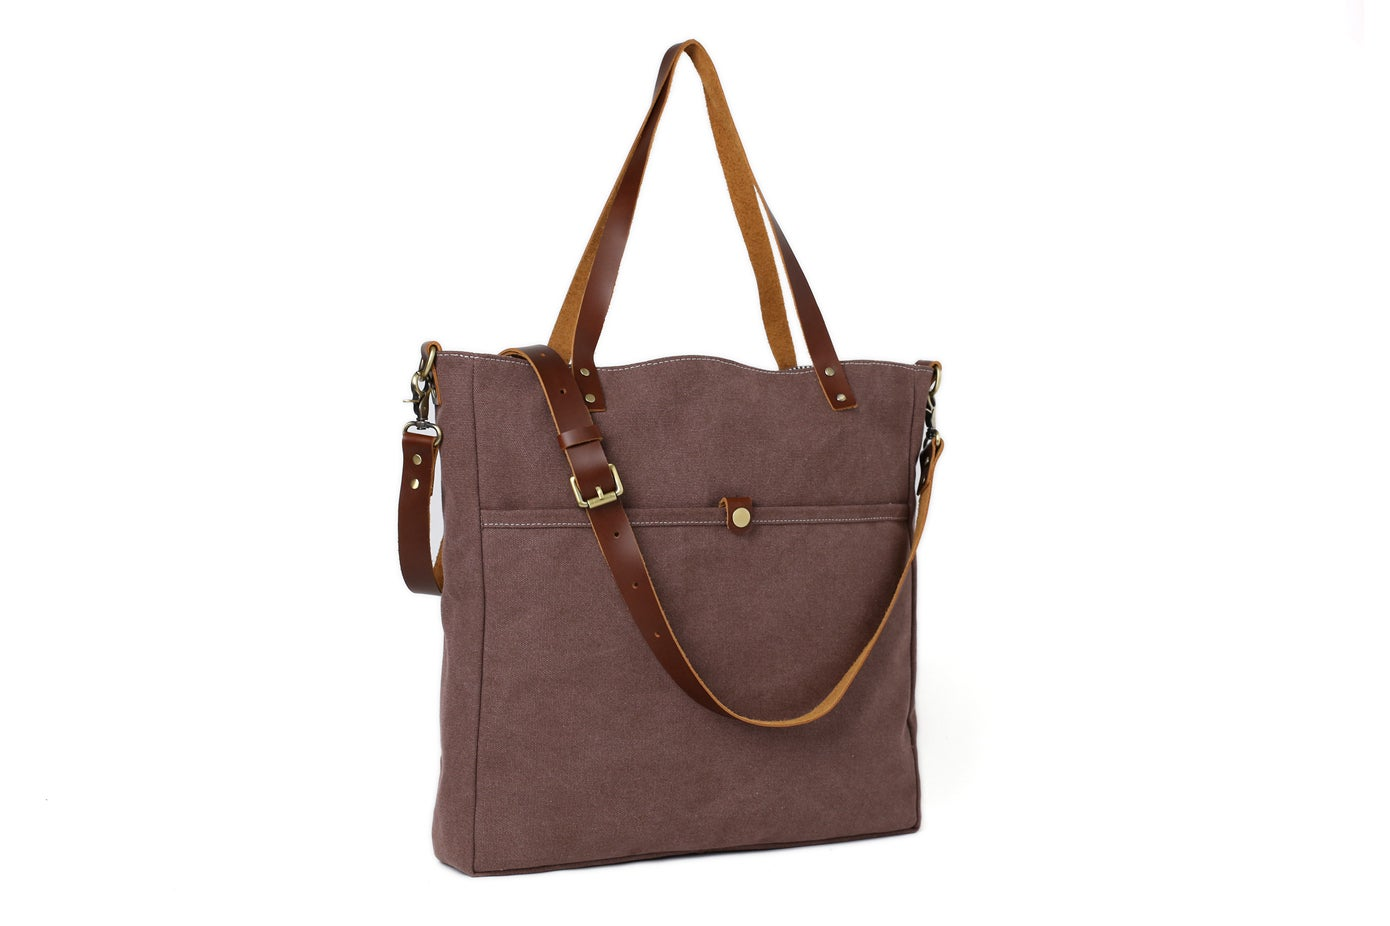 Handmade Canvas Tote Bag Messenger School Handbag Shoulder 16000